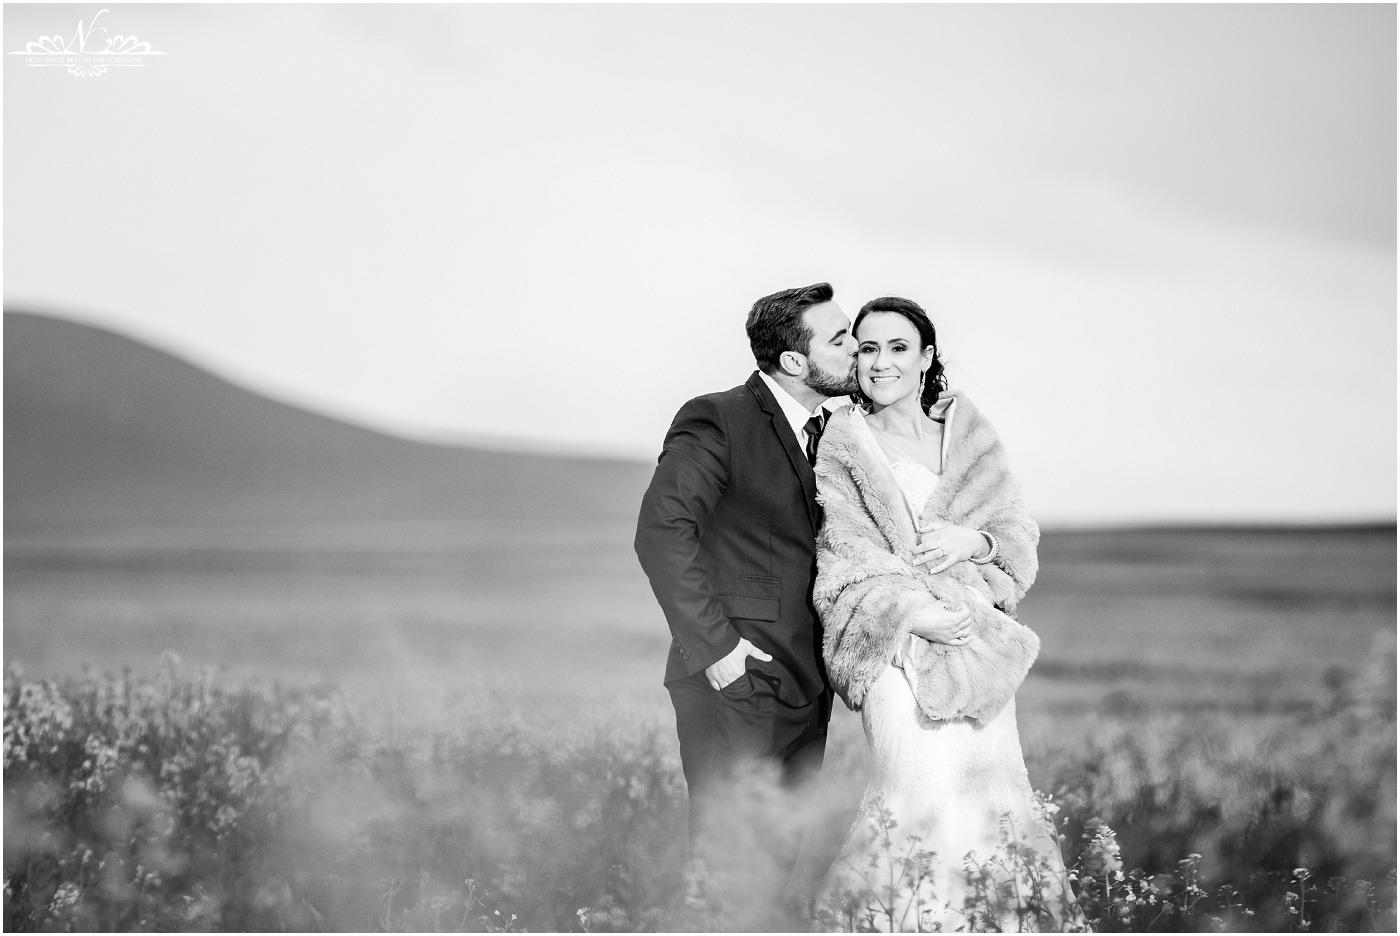 Eensgezind-Wedding-Photos-Nelis-Engelbrecht-Photography-154